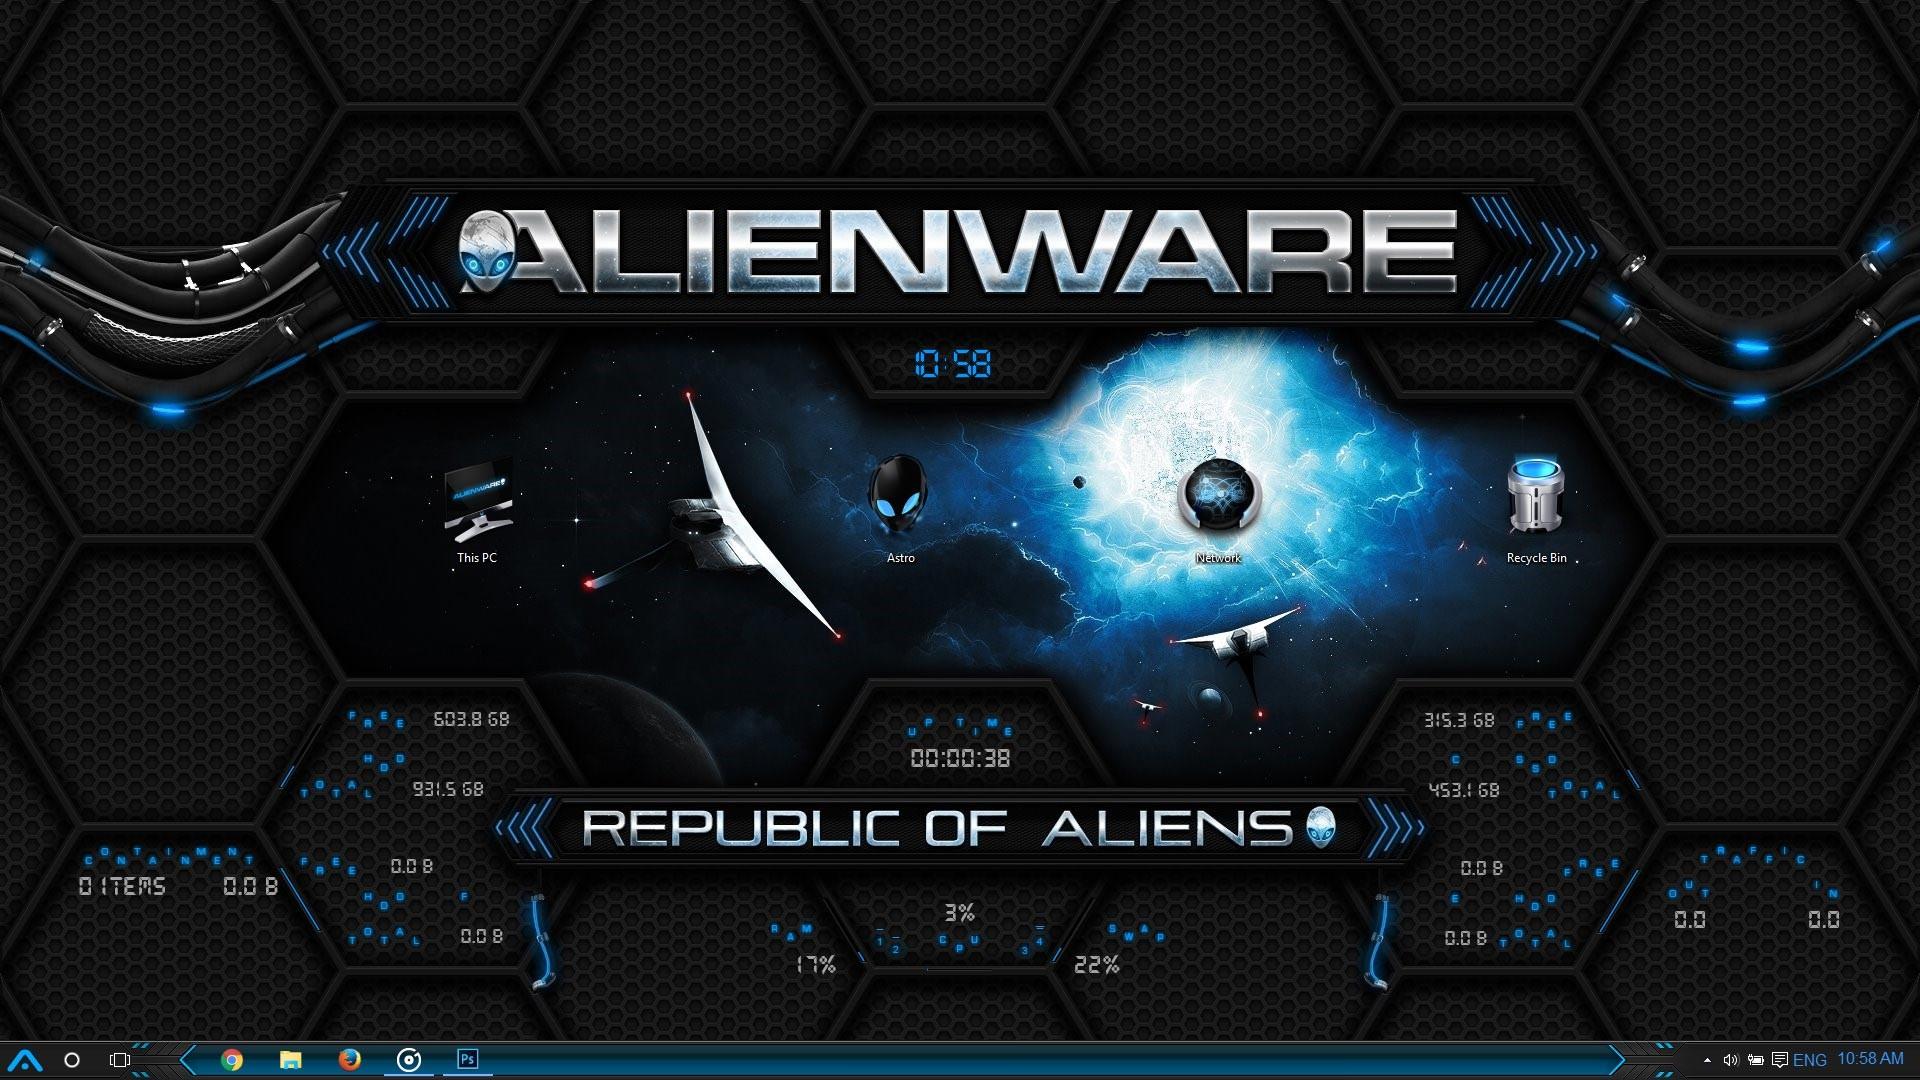 Alienware Windows 10 Theme